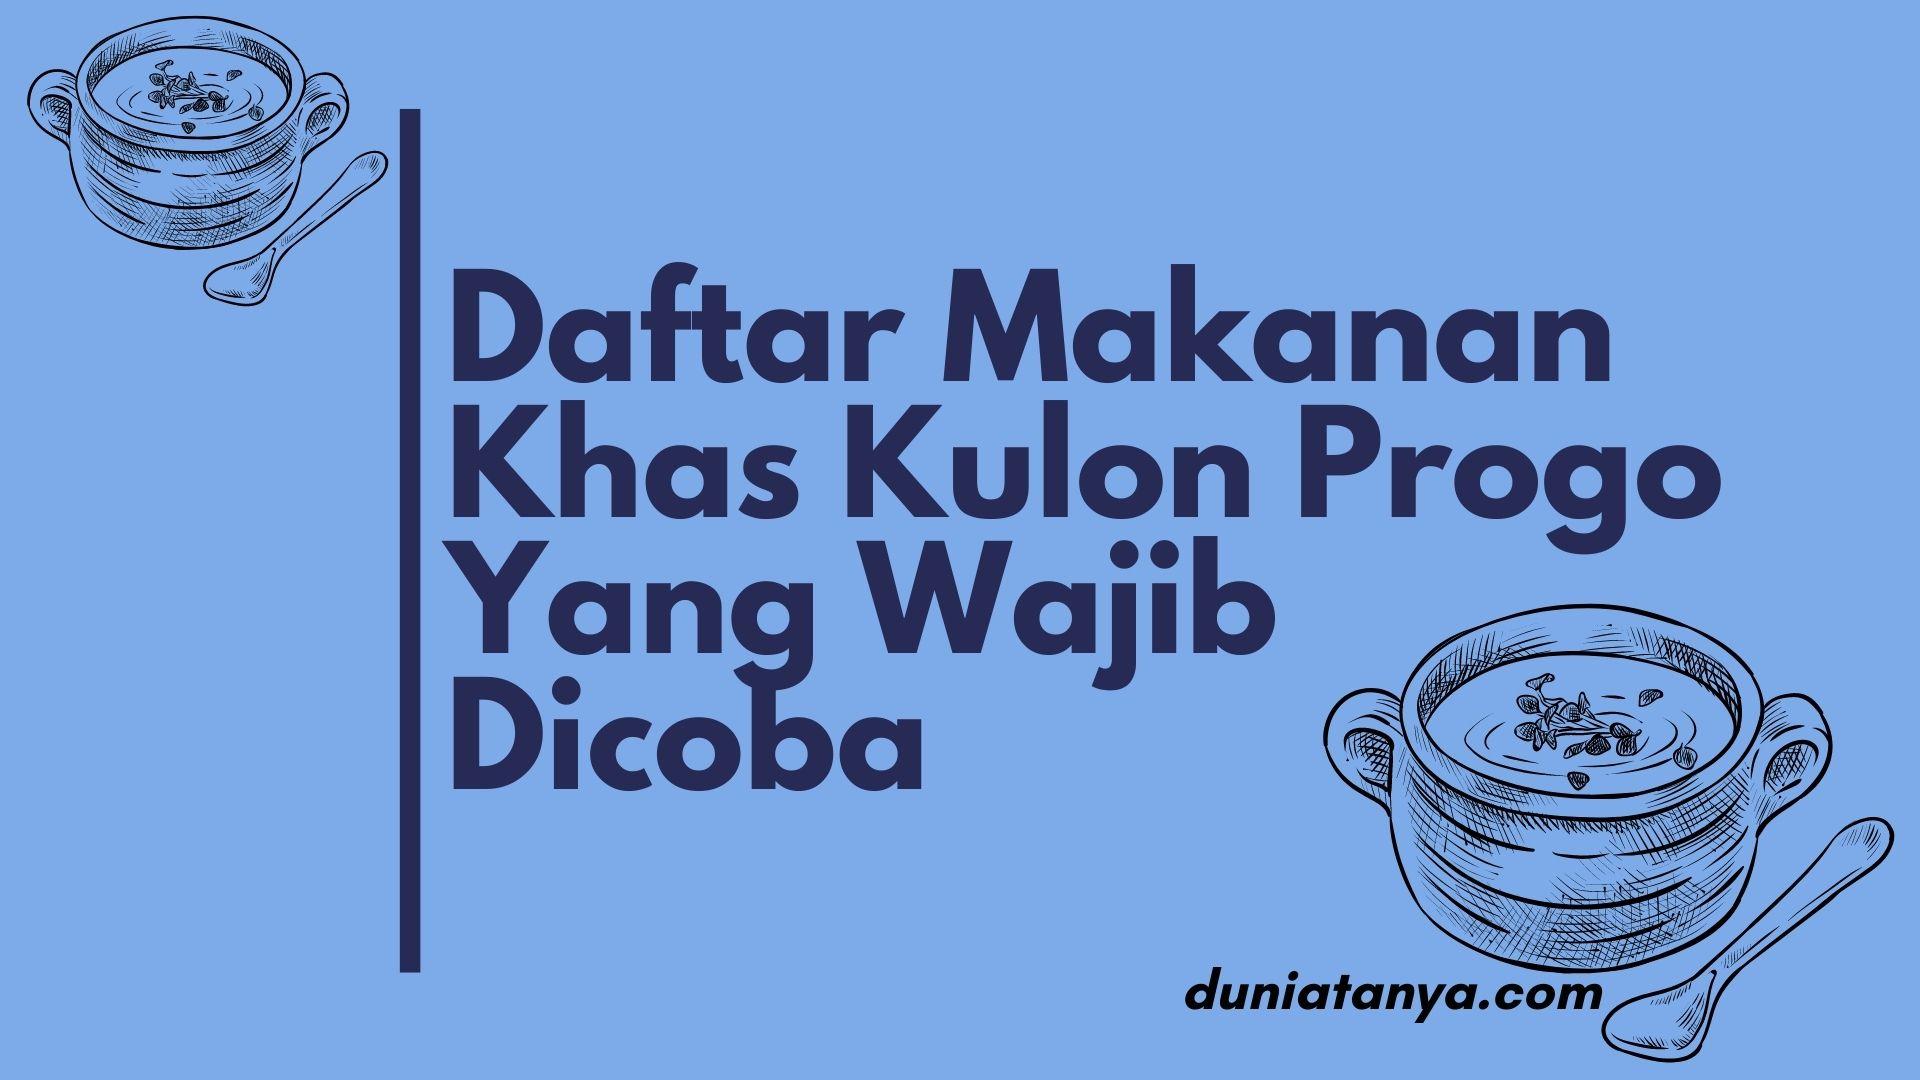 You are currently viewing Daftar Makanan Khas Kulon Progo Yang Wajib Dicoba